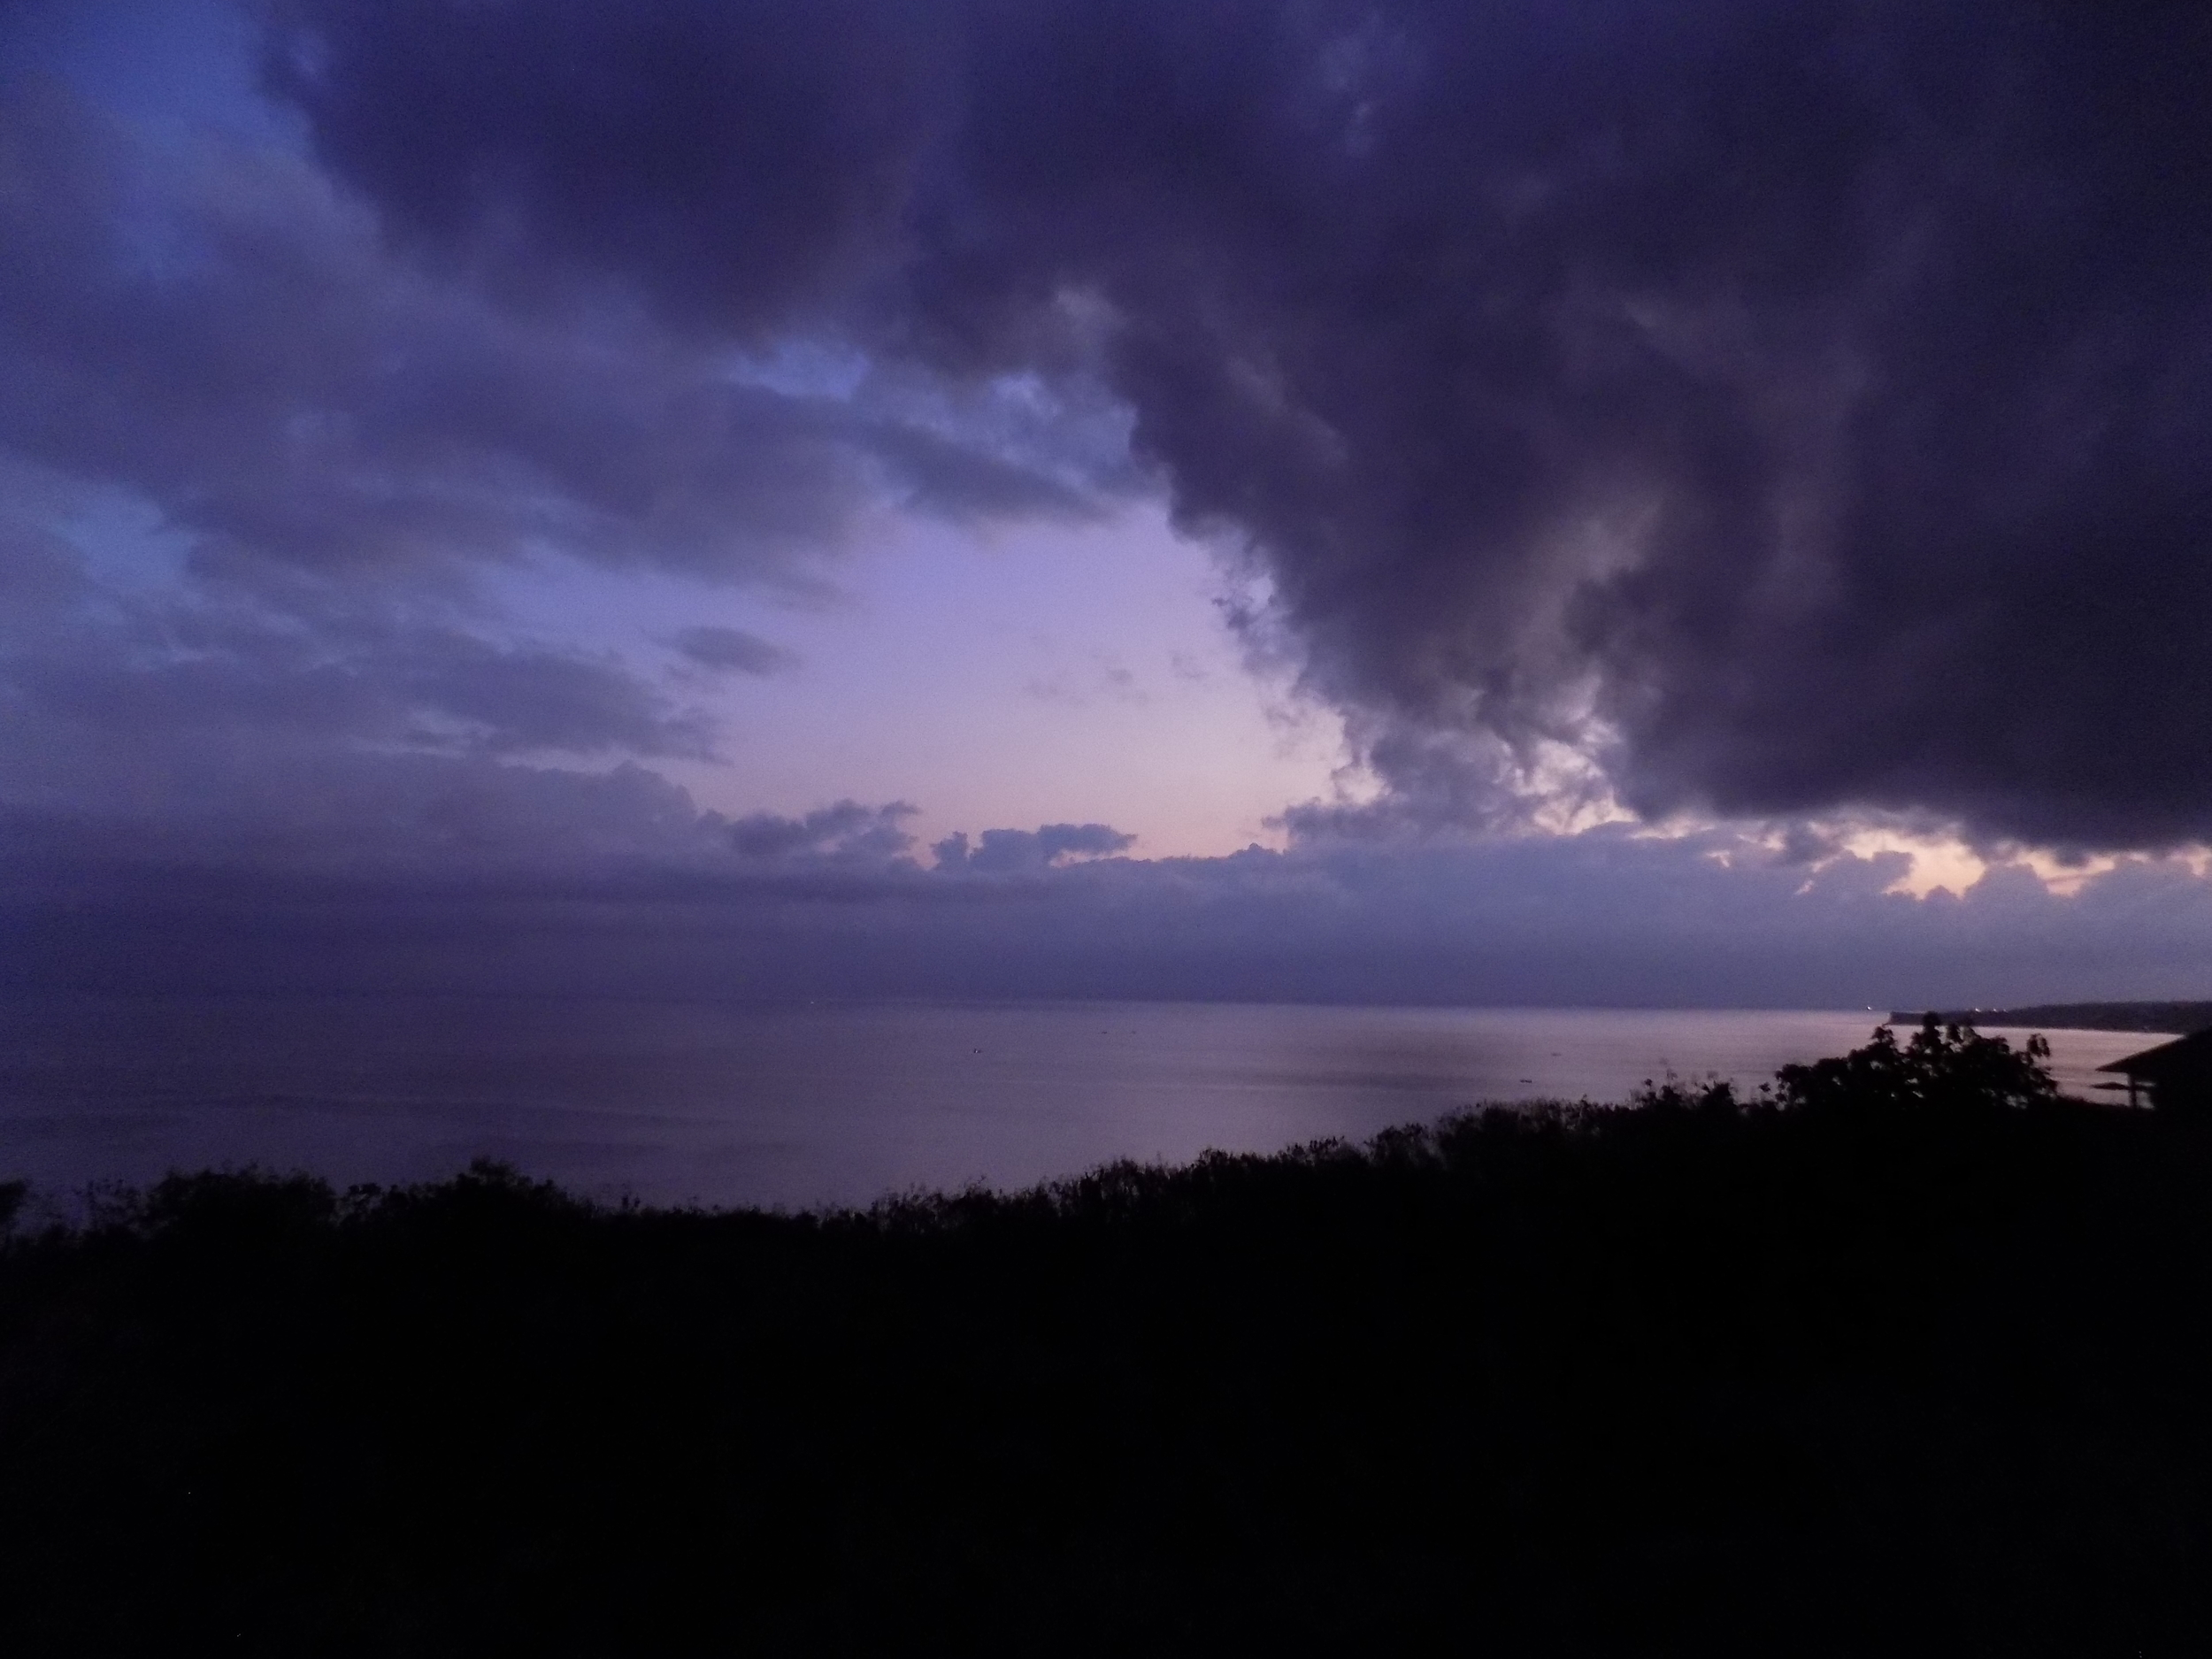 Sunrise on the Indian Ocean